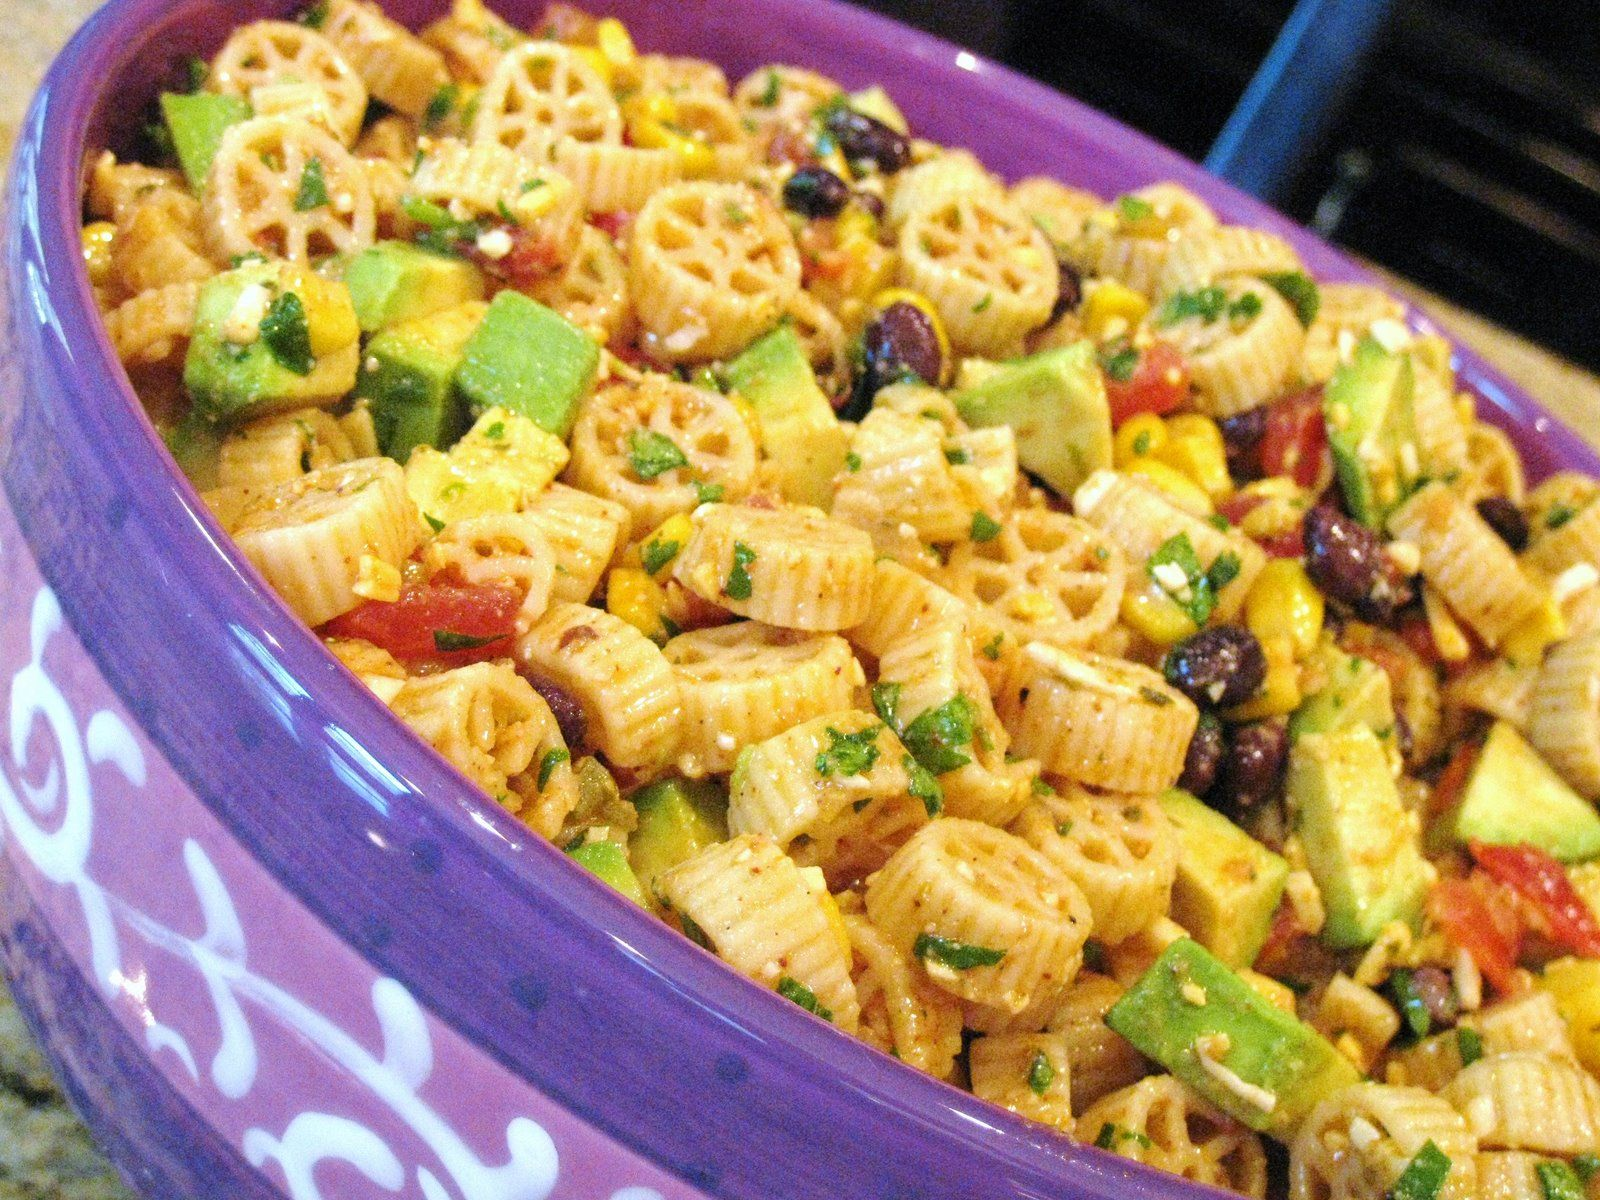 Taco Pasta Salad (add seasoned taco meat to make it a main dish)